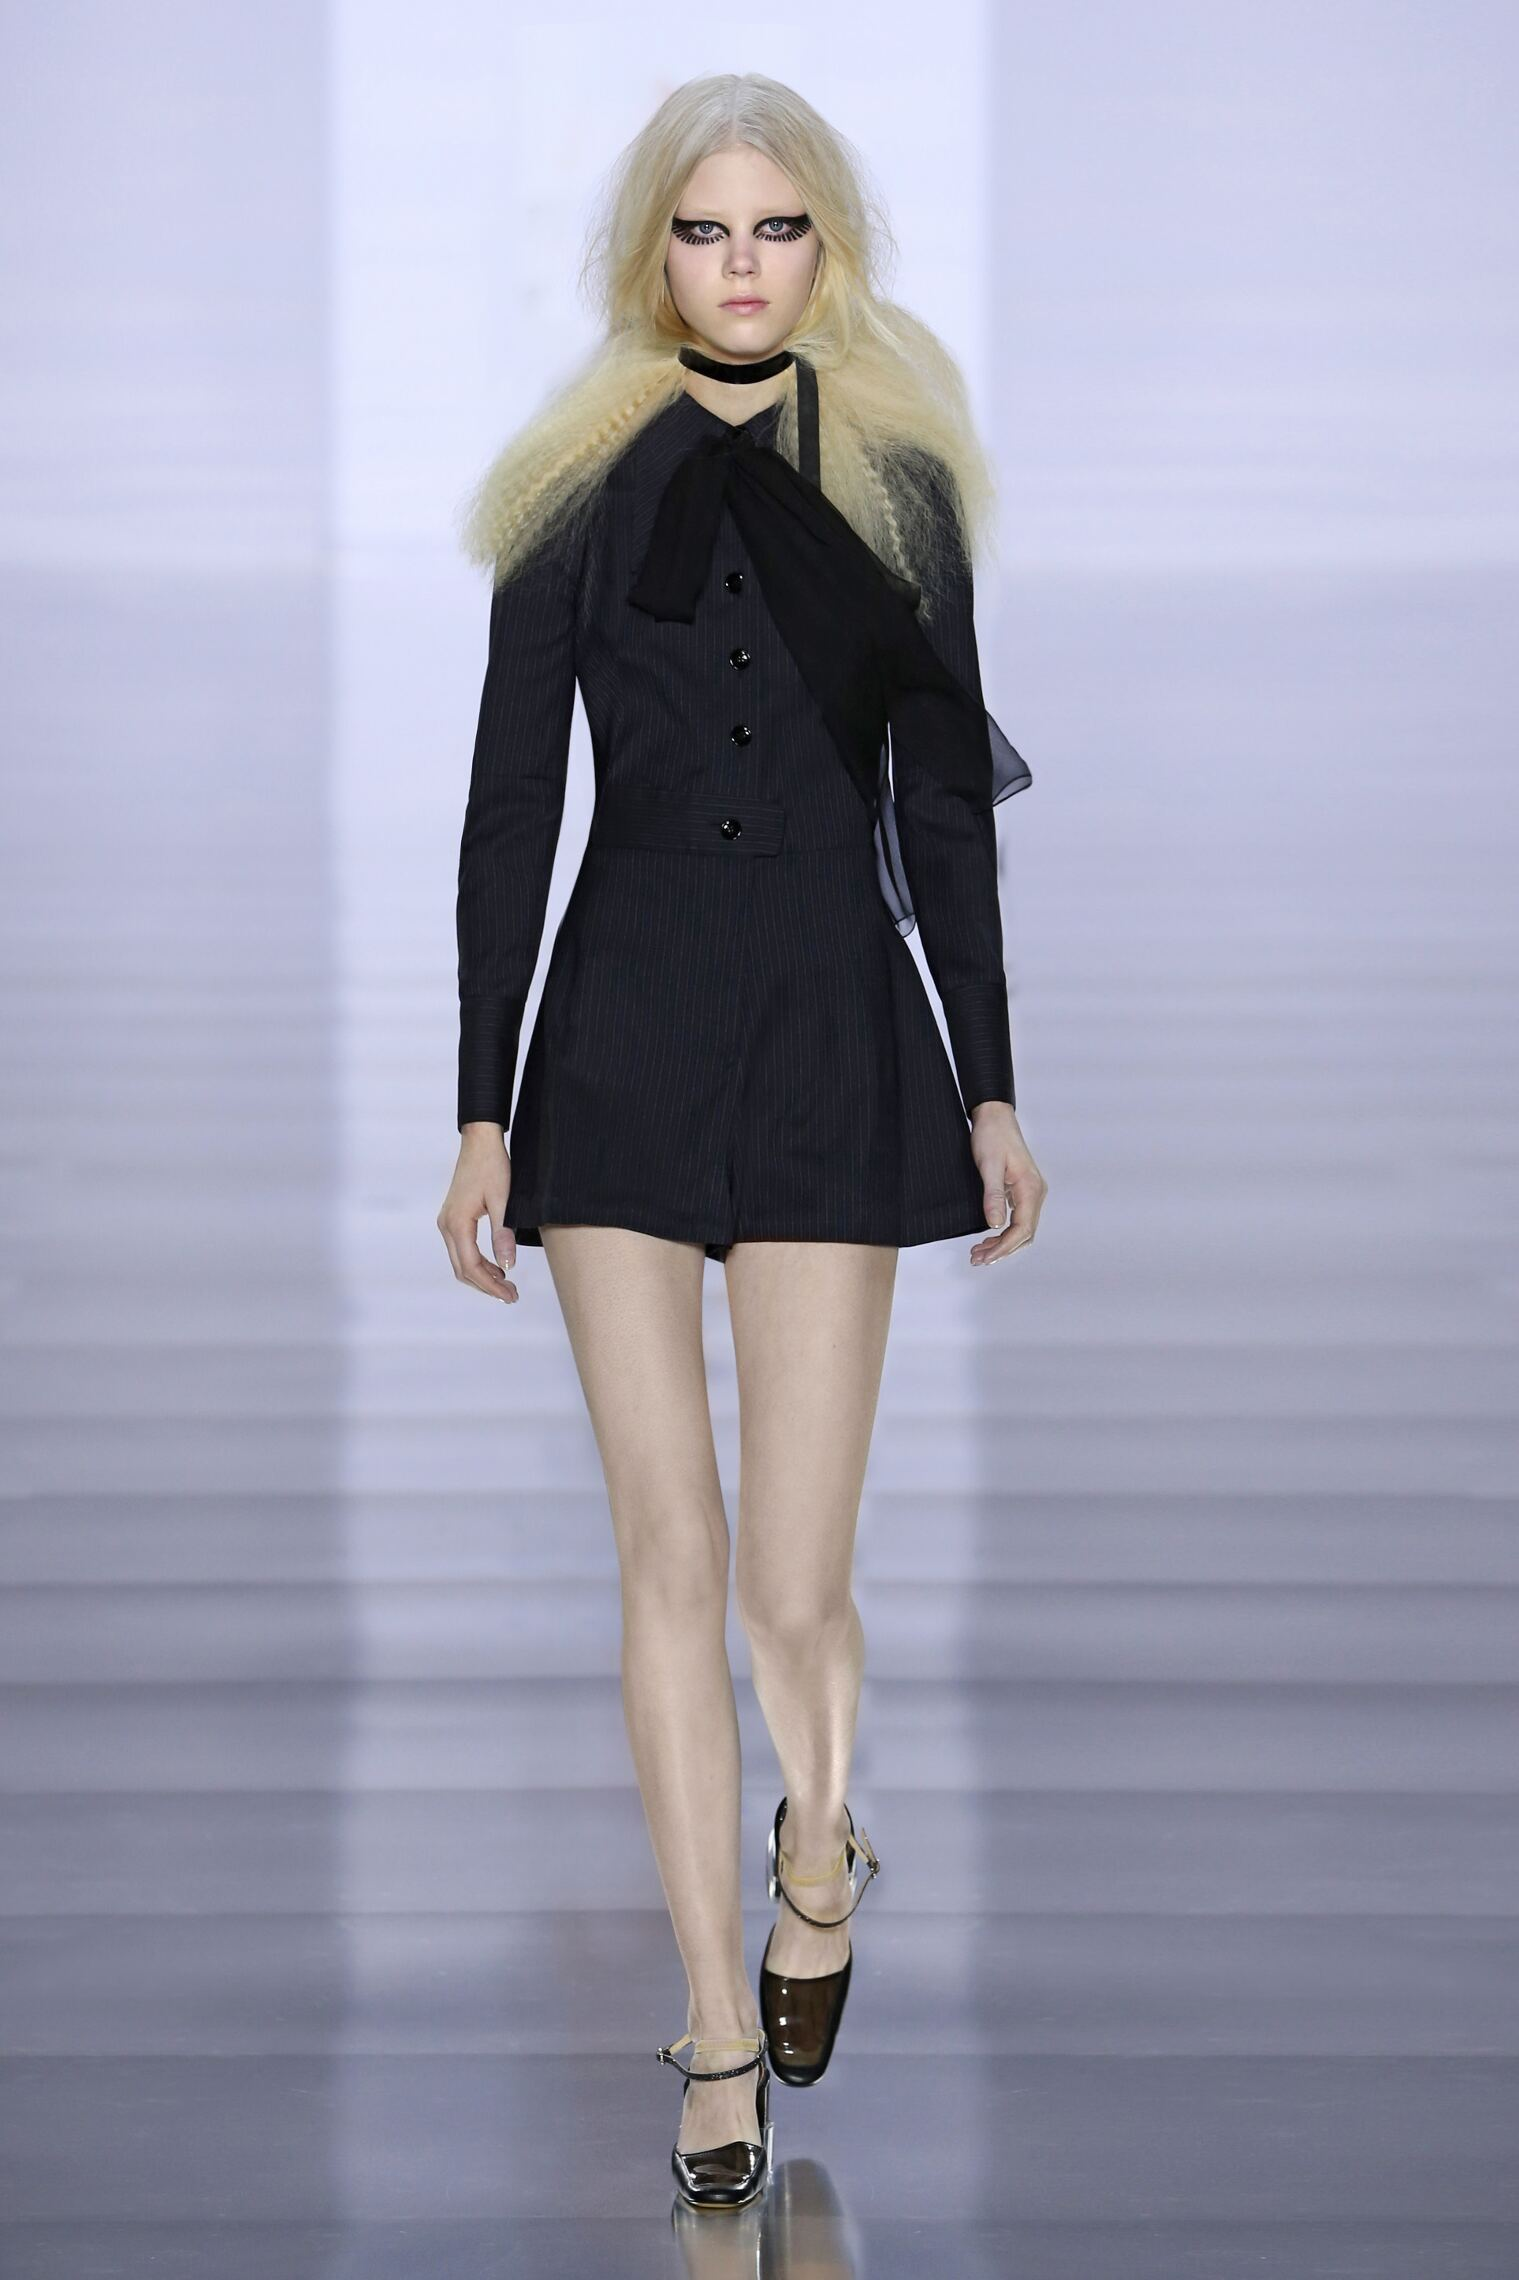 Winter 2015 Woman Trends Maison Margiela Collection